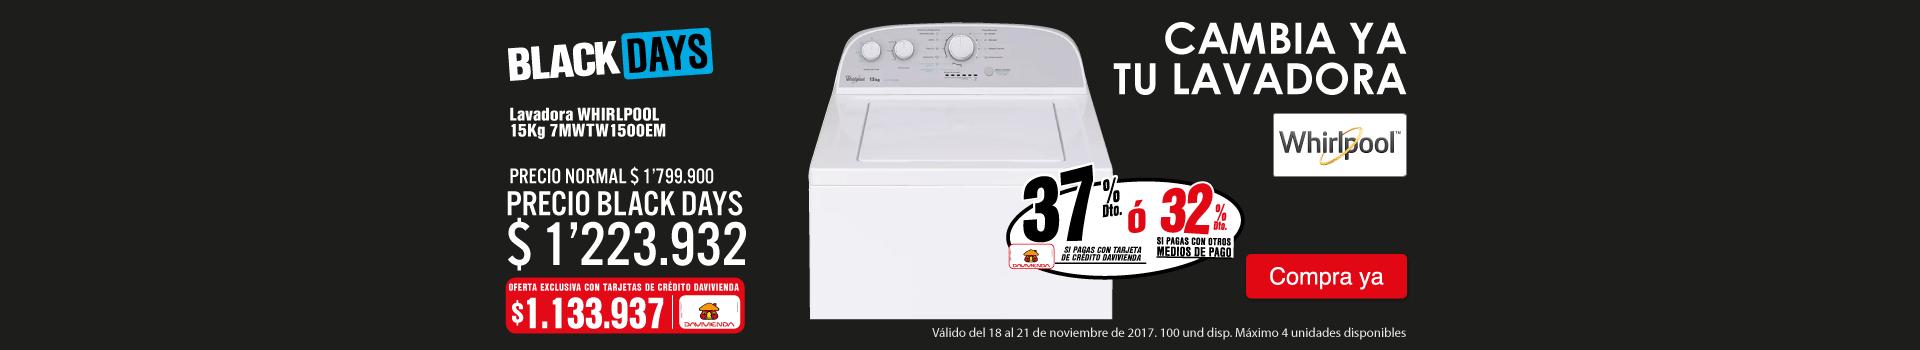 CAT ELECT-KT4-LB-lavadoraWHIRLPOOL15kg-7MWTW1500EM-prod-nov18-21